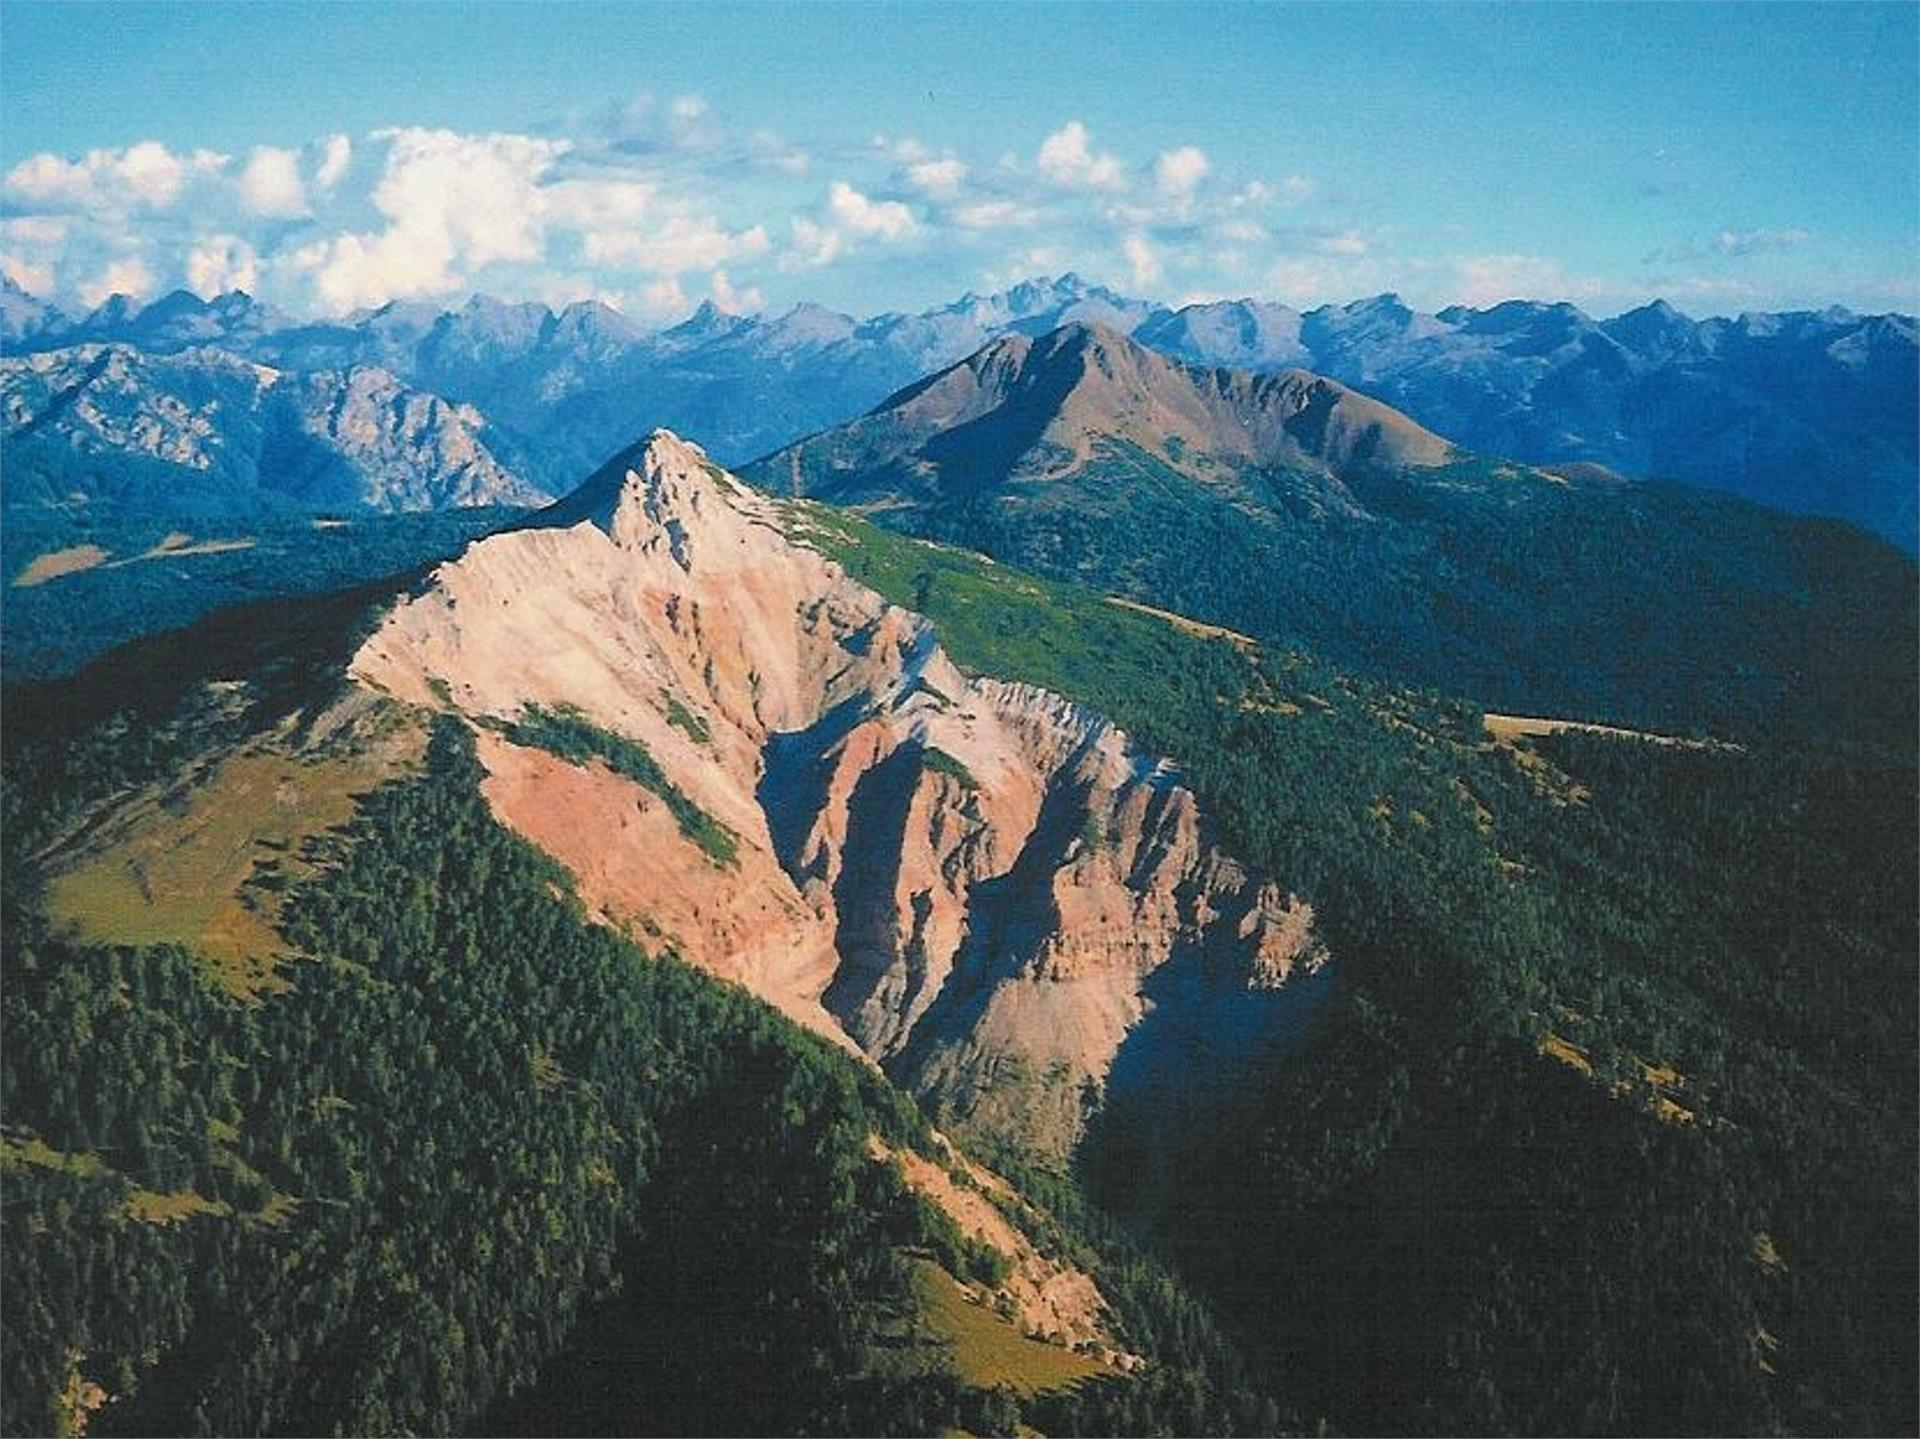 GEOPARC Bletterach - Dolomiti UNESCO Patrimonio Mondiale